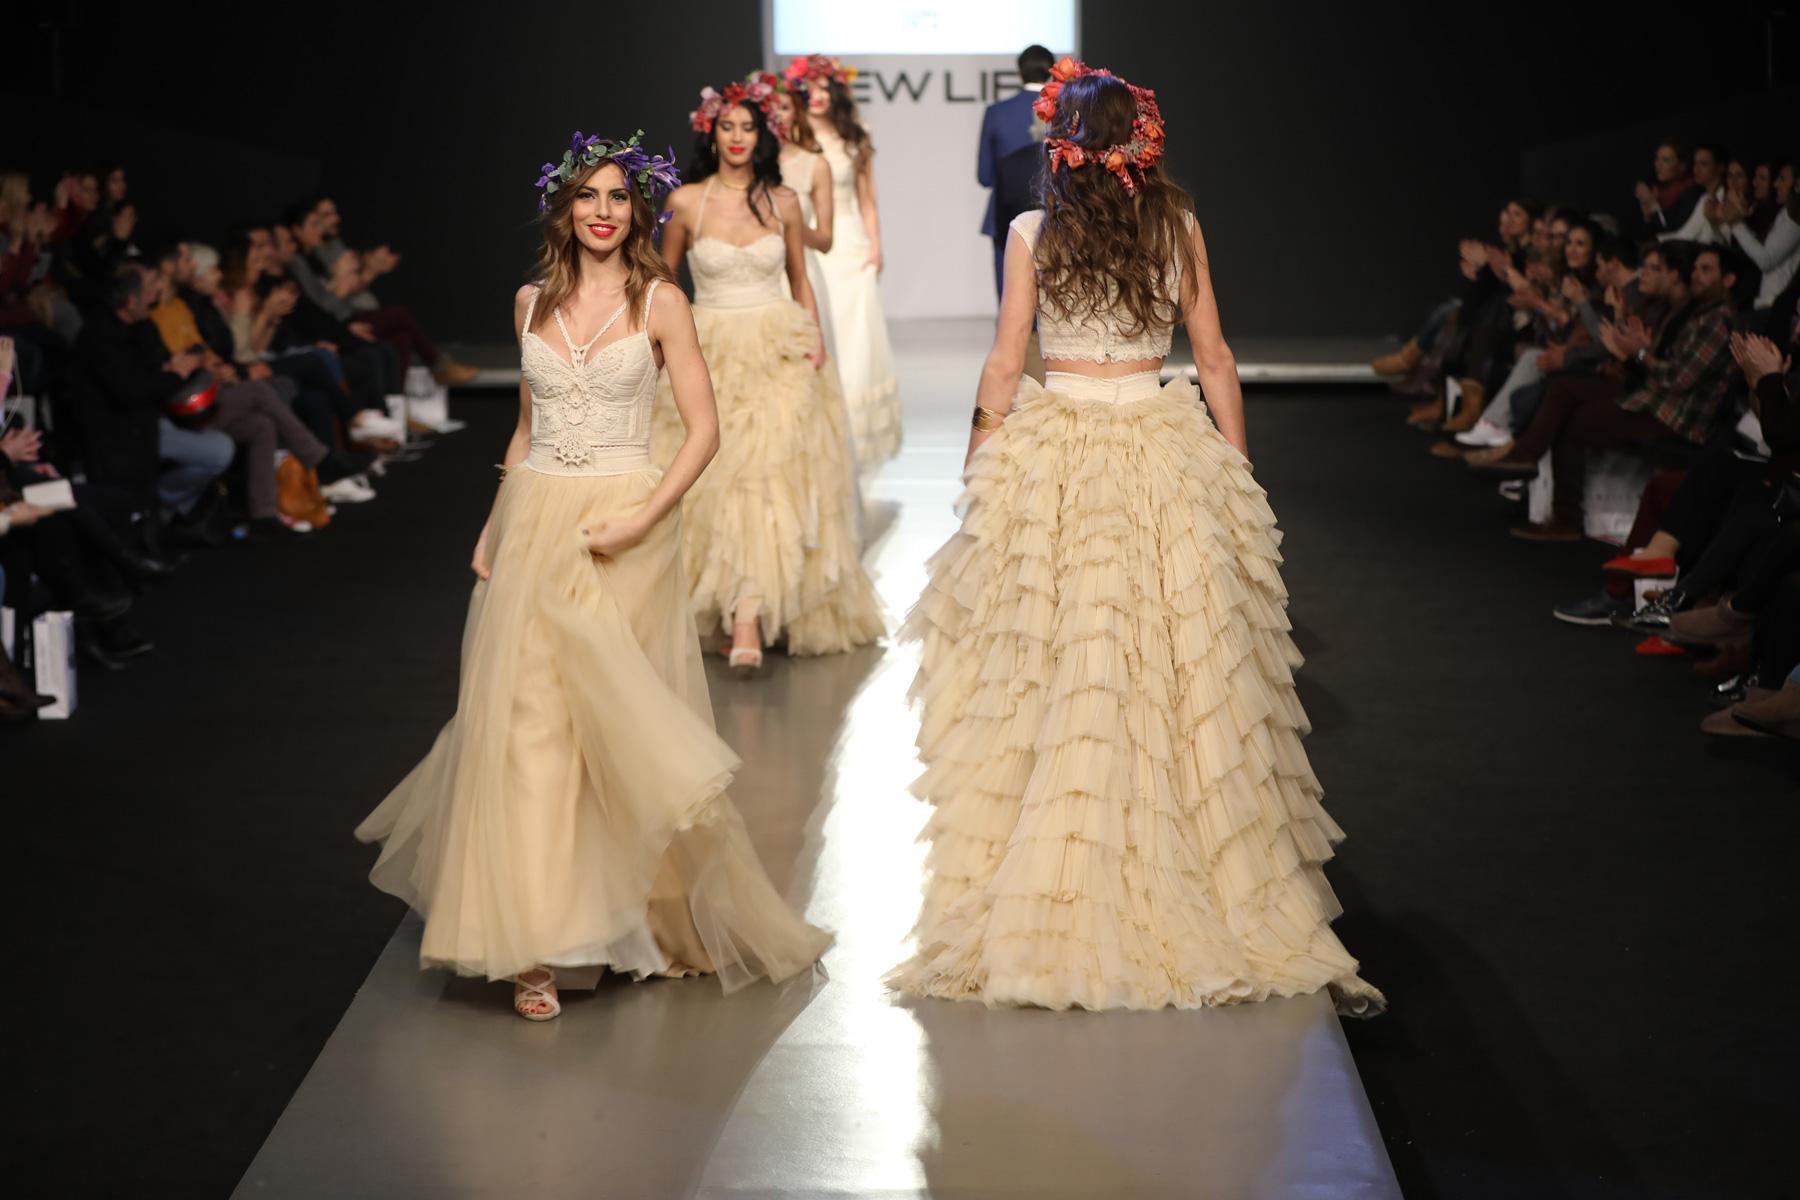 aa233273457b New Life  17...seen the catwalk  - Atelier Zolotas blog